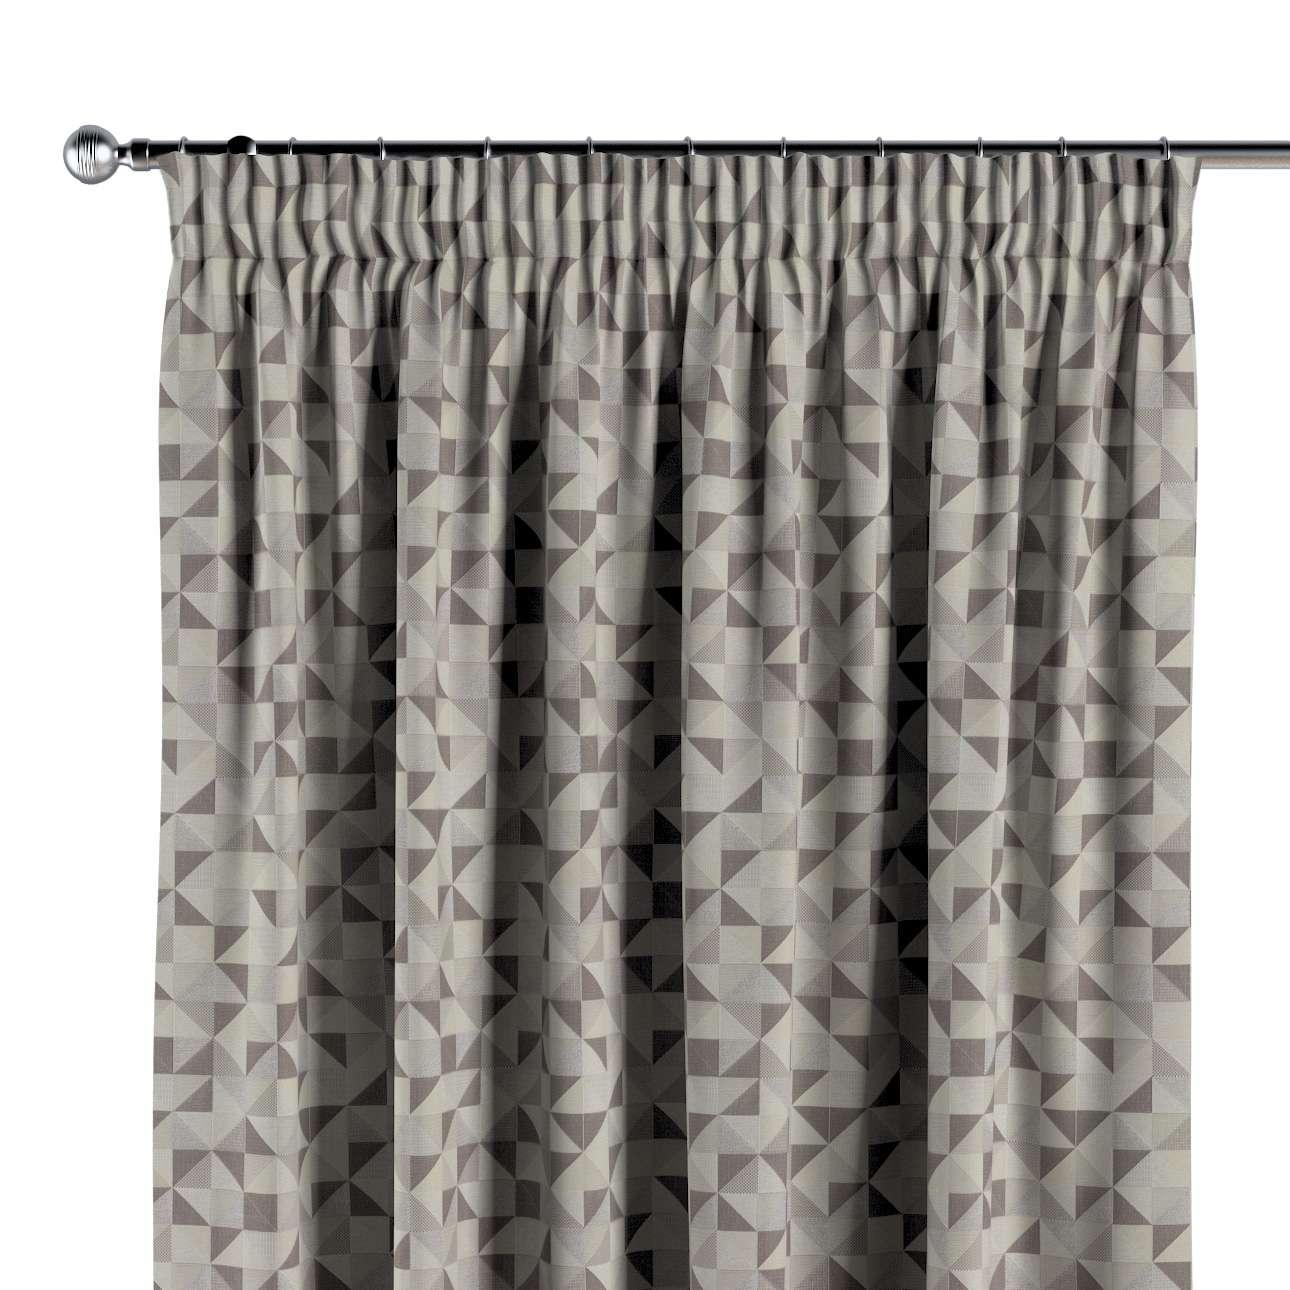 Pencil pleat curtain in collection Retro Glam, fabric: 142-85